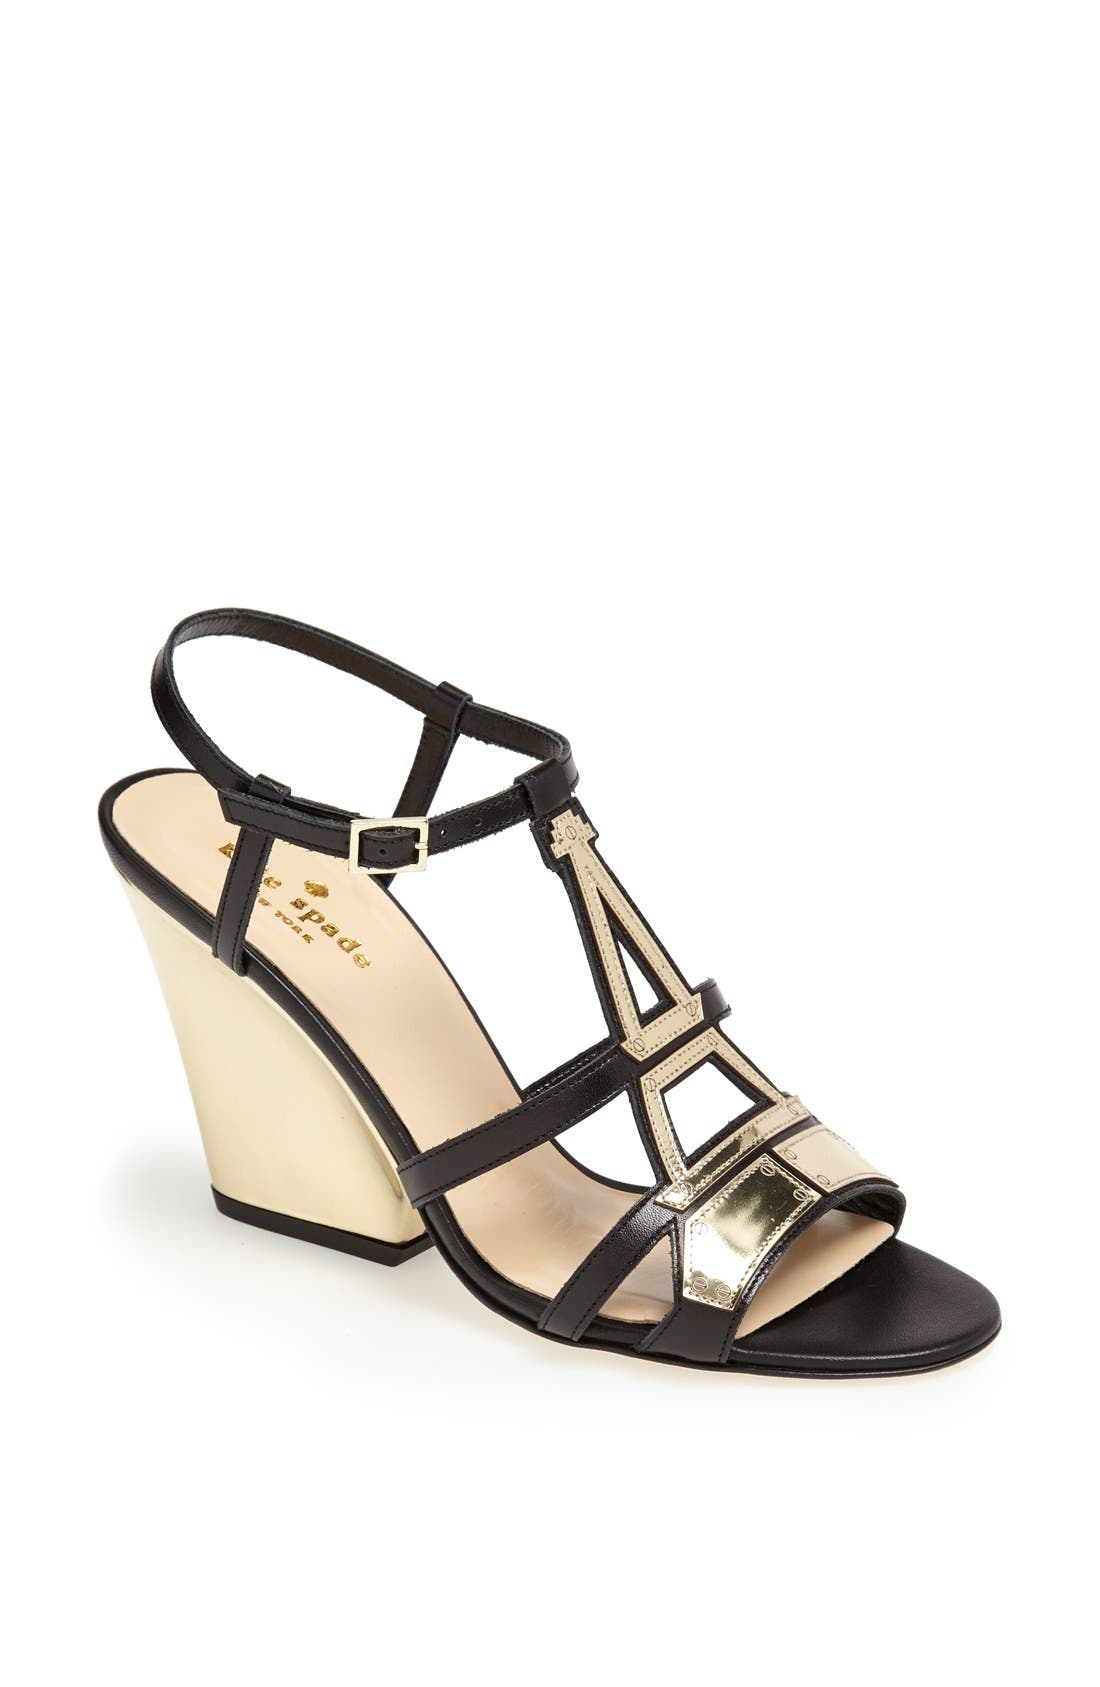 Main Image - kate spade new york 'inoltra' sandal